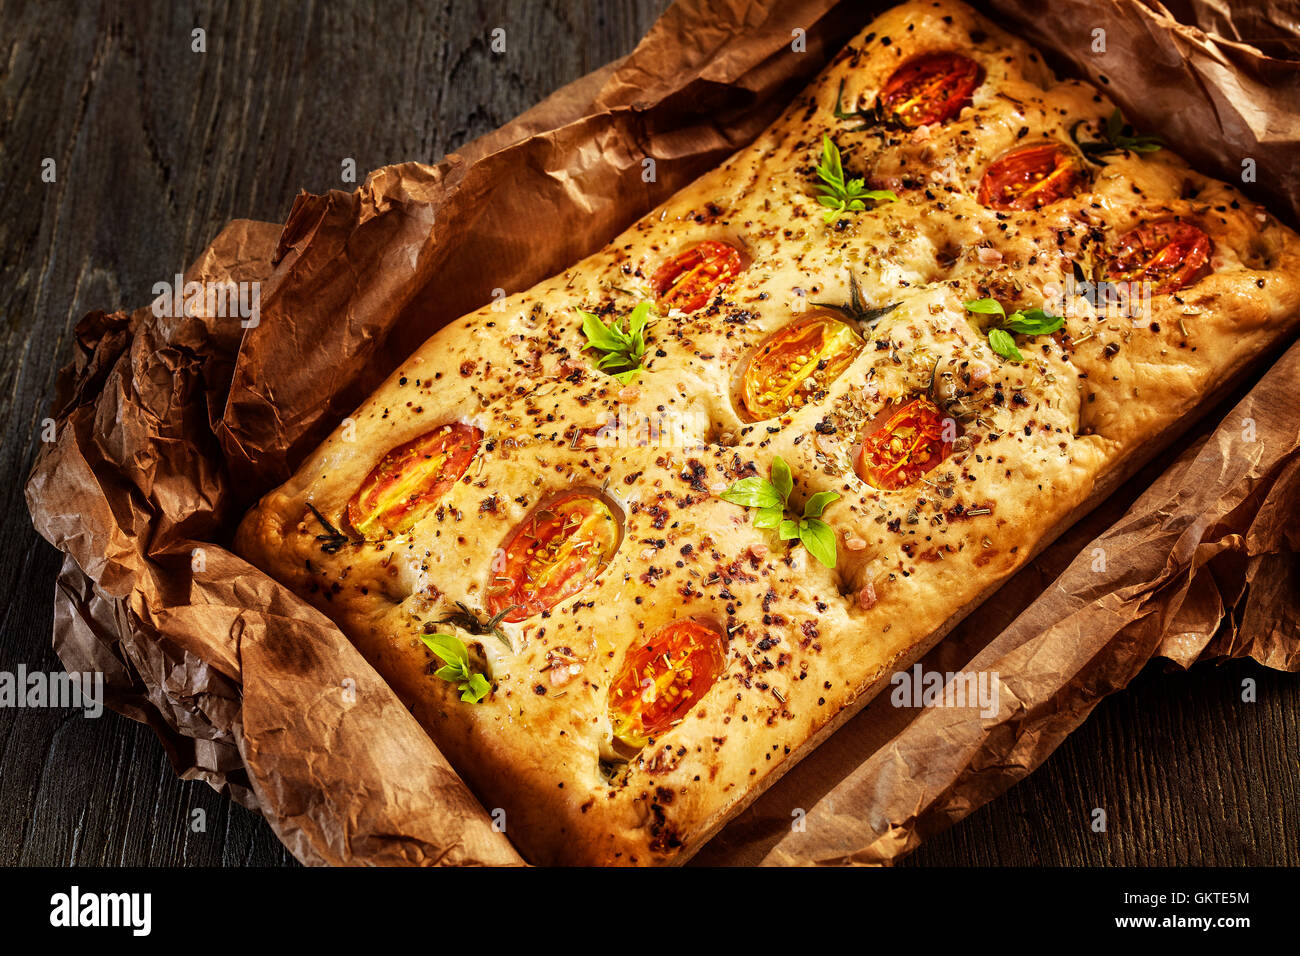 Recién horneados italiana tradicional focaccia con tomates en una mesa de madera antigua. Imagen De Stock